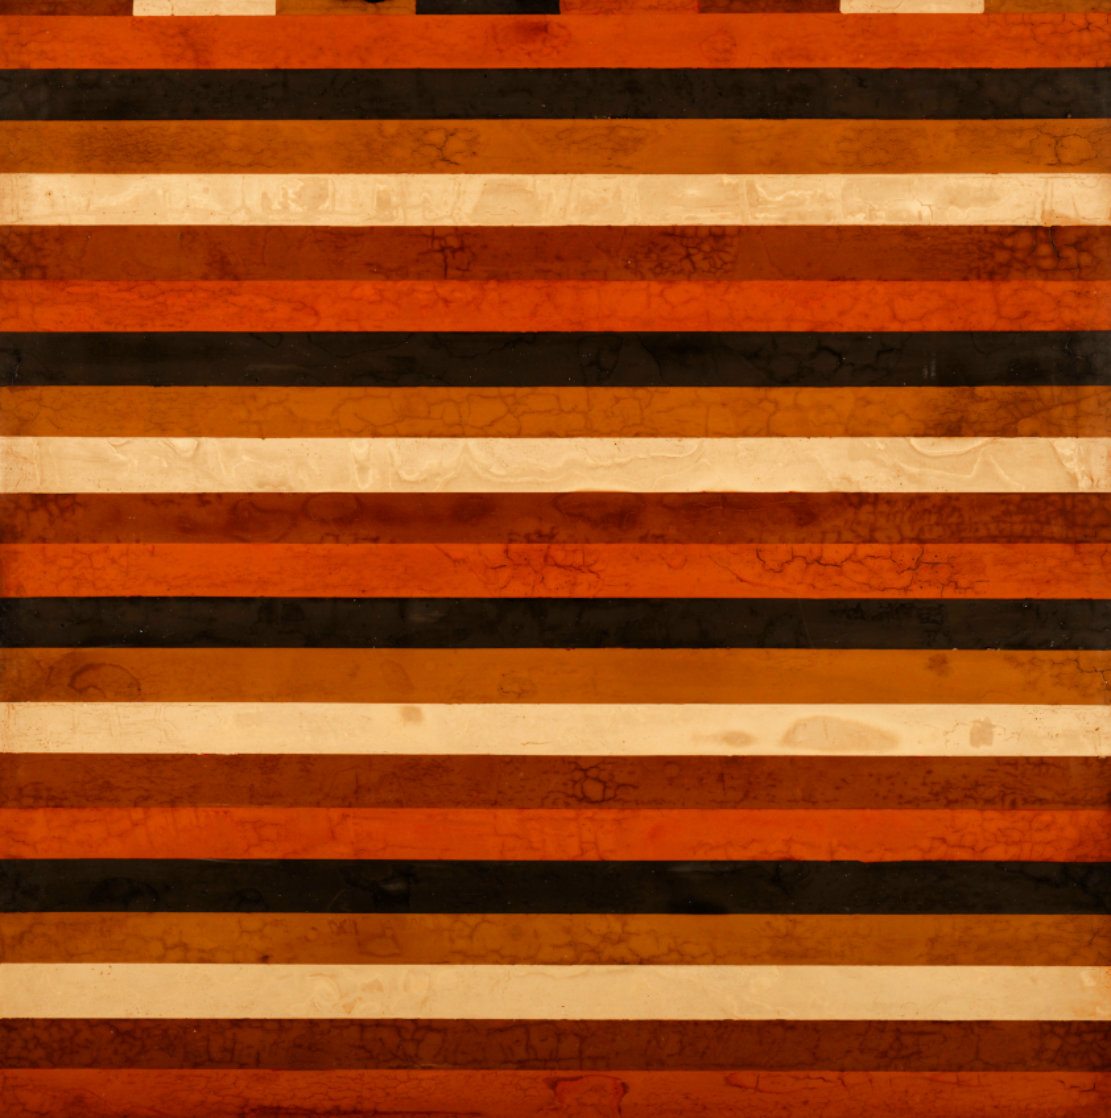 Striper 2005 42x42 Super Huge Original Painting by Kris Cox